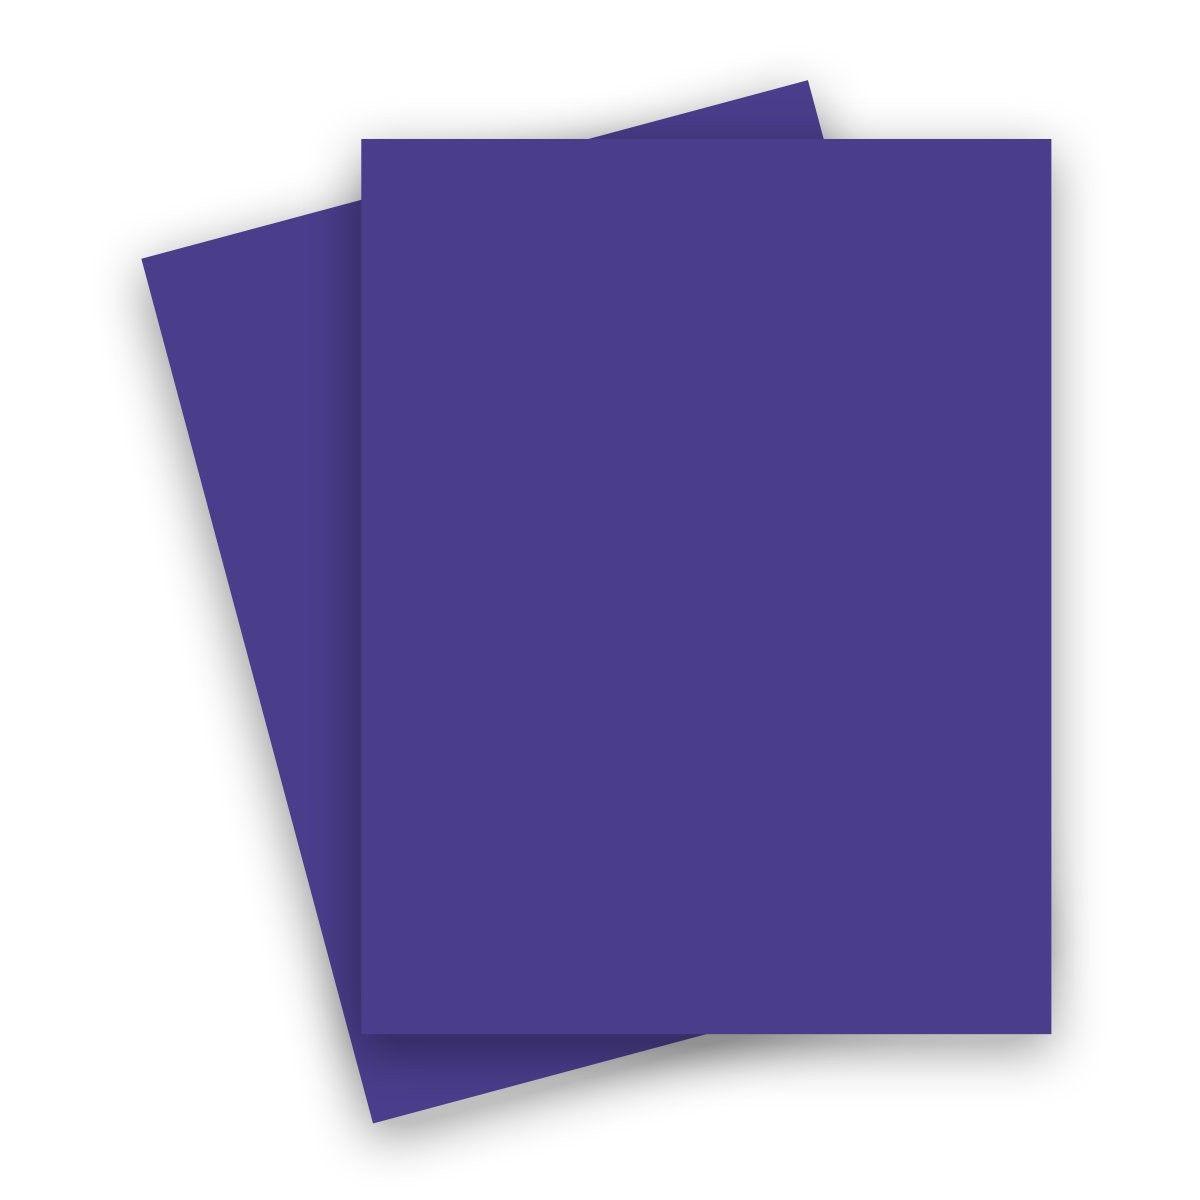 Curious Skin Lavender 8 5 X 11 Card Stock Paper 100lb Cover 25 Pk Card Stock Cardstock Paper Curious